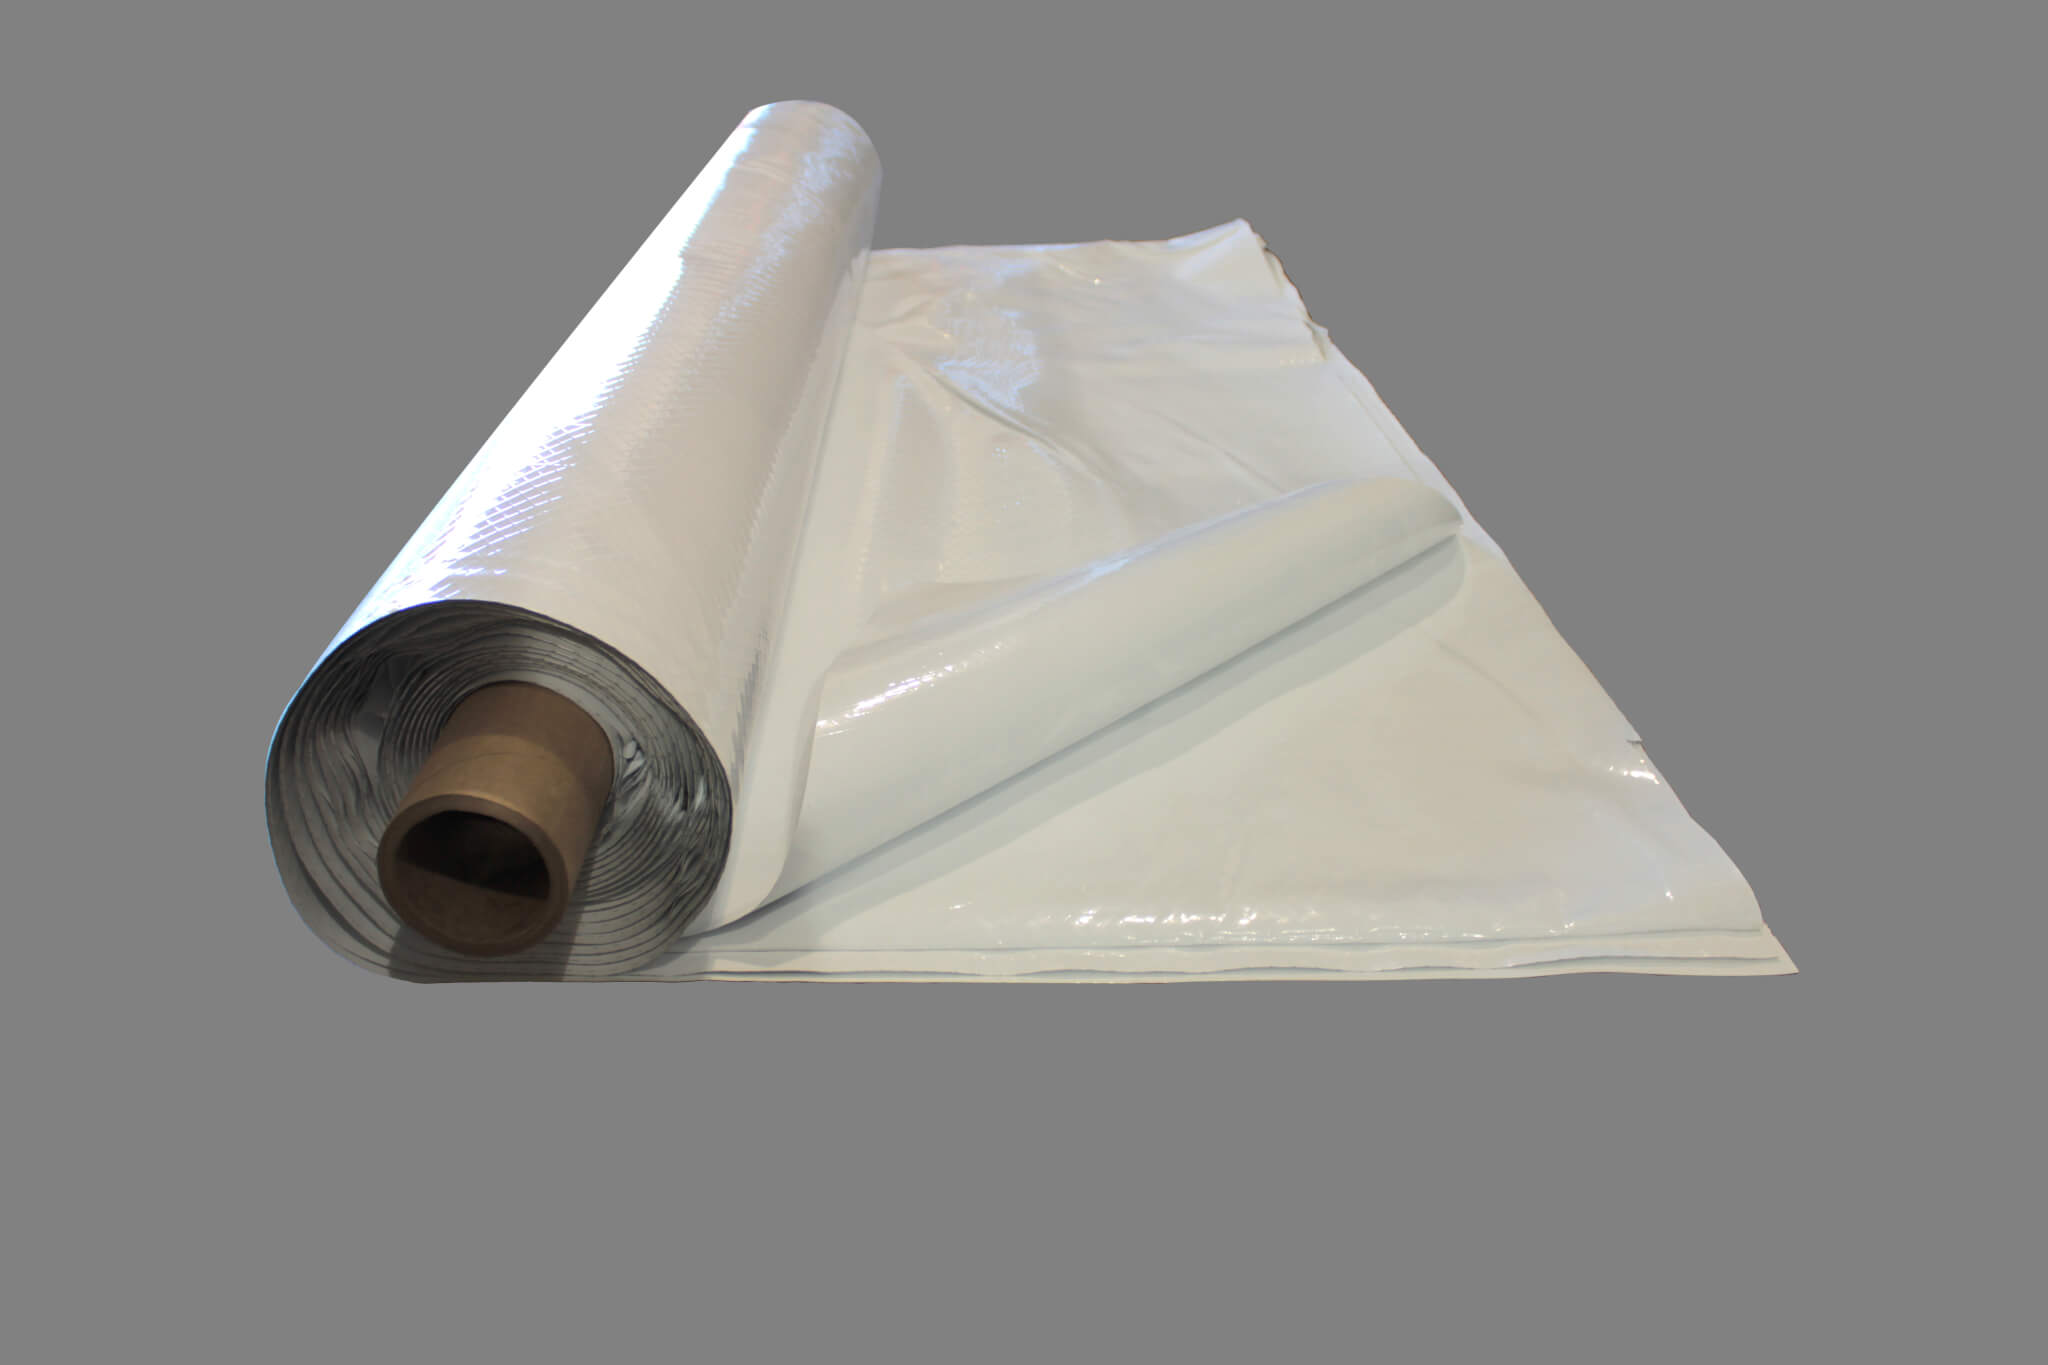 50 X Plastic Sheeting 100